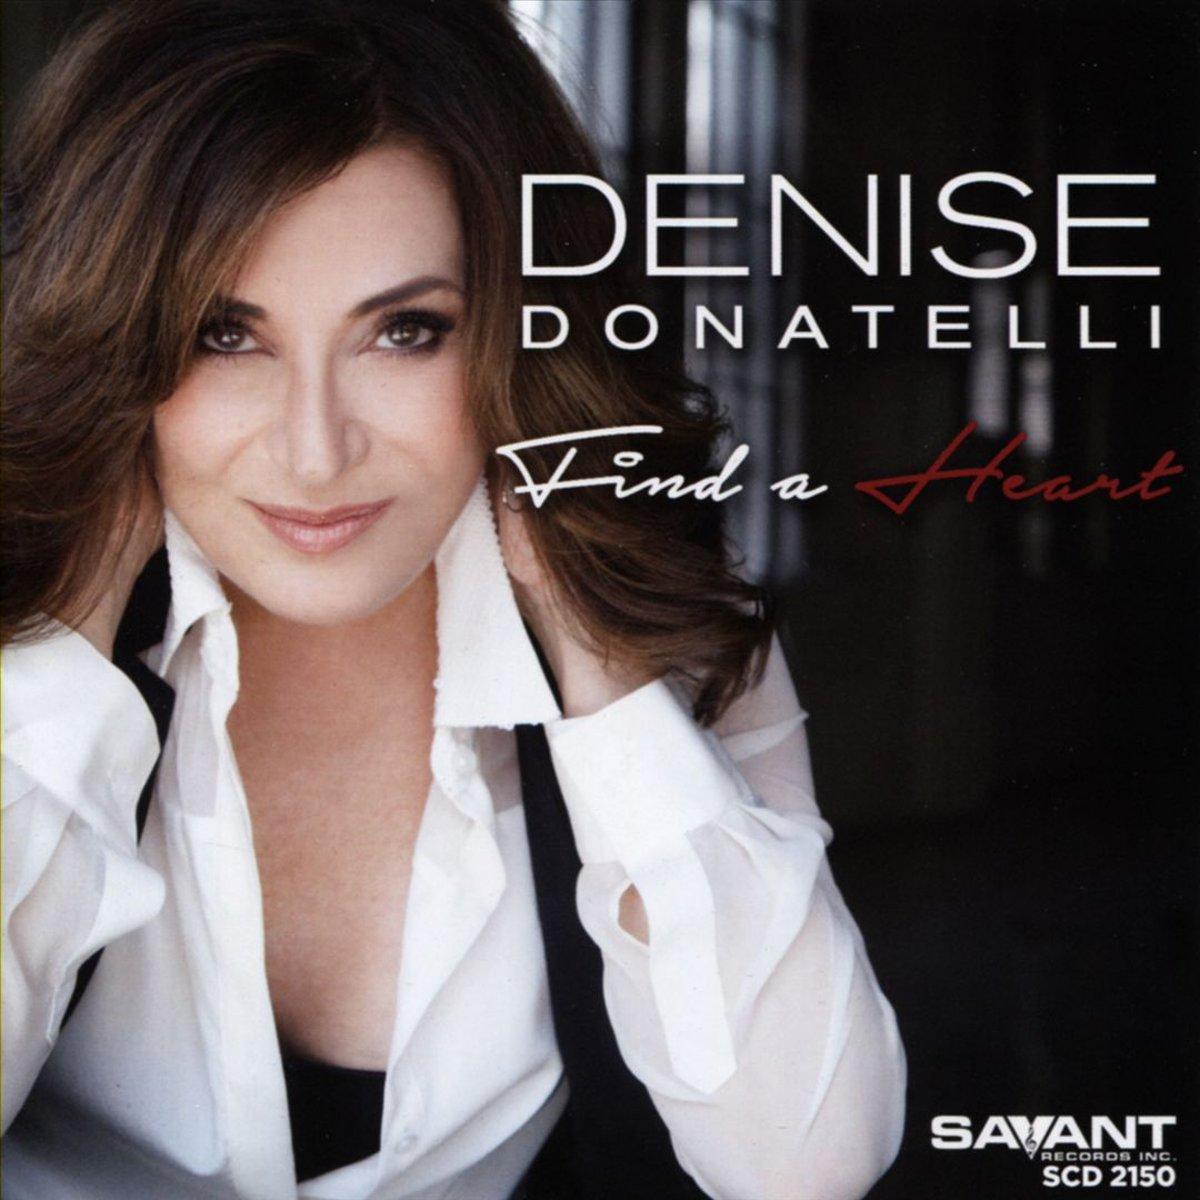 Denise Donatelli Denise Donatelli Find A Heart